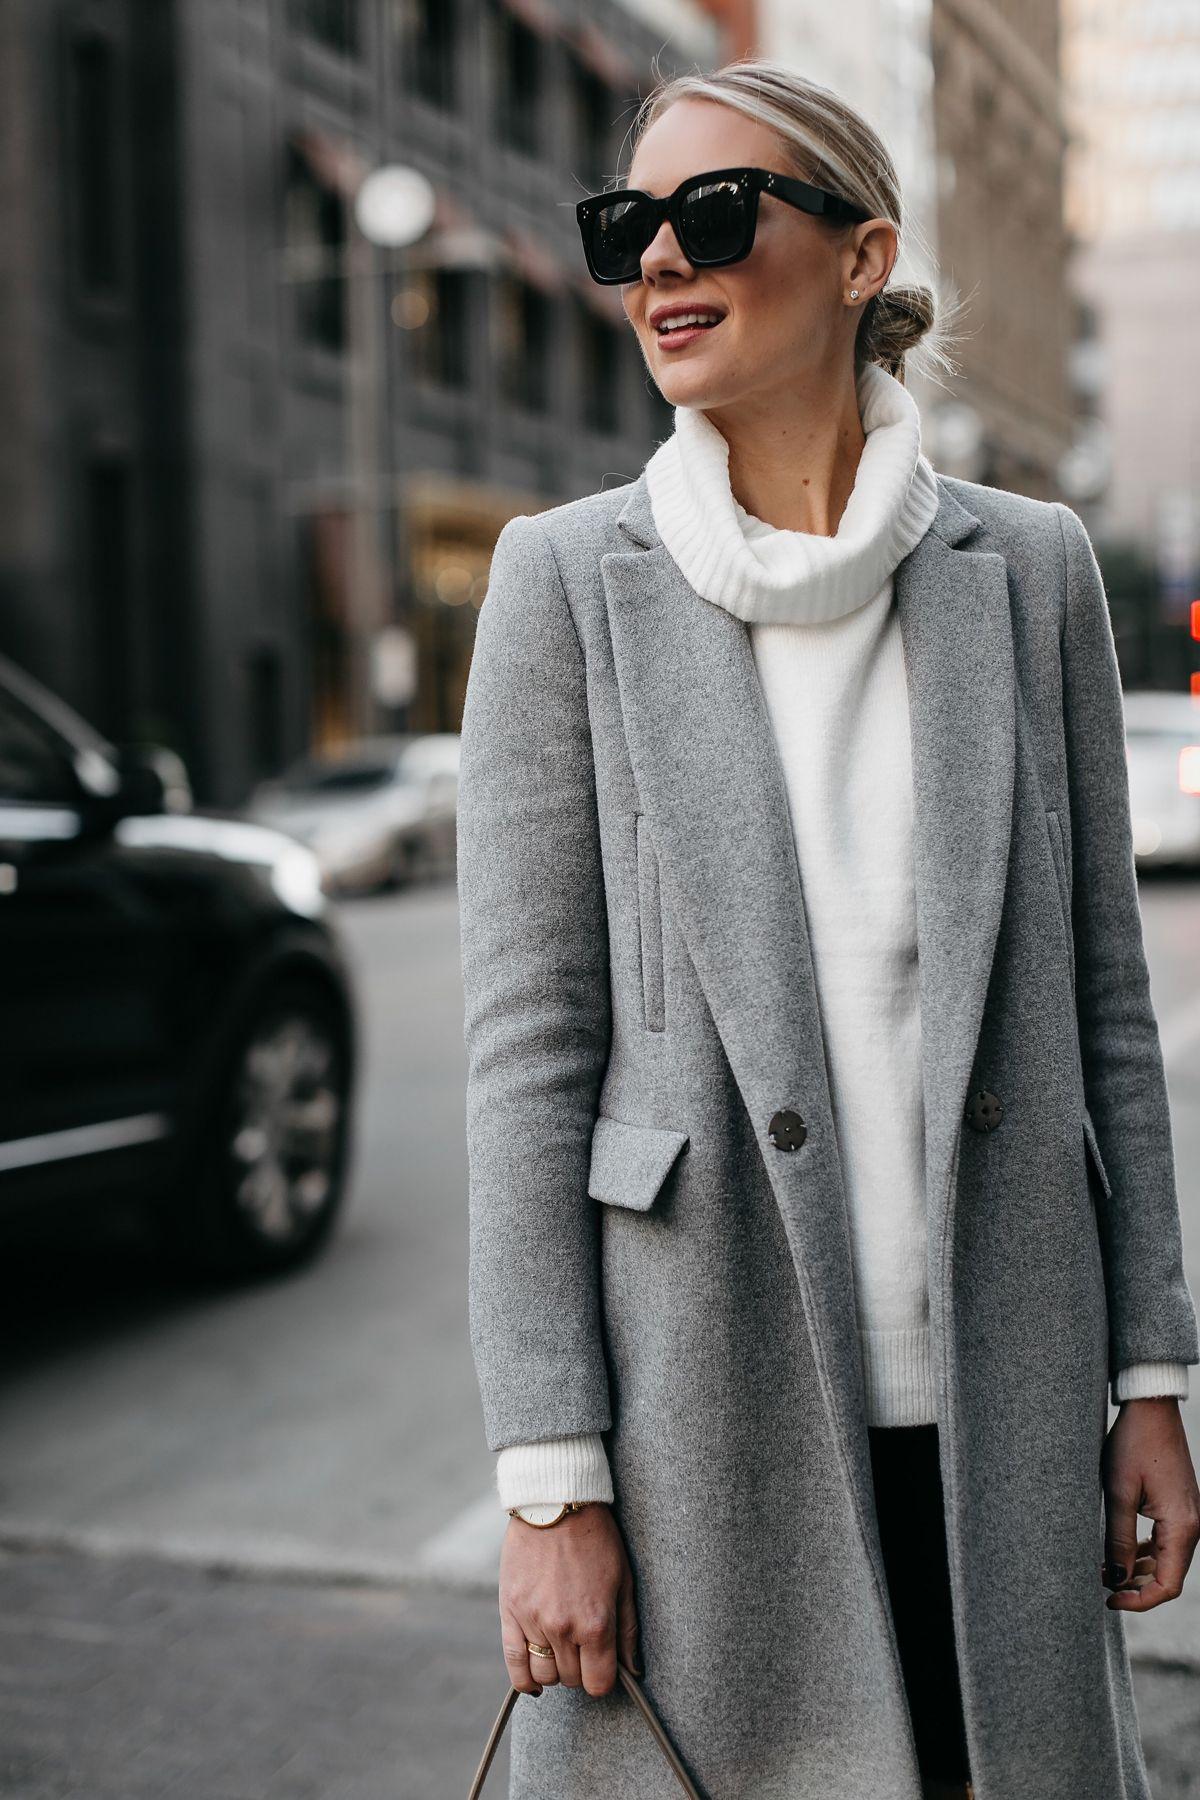 Blonde Woman Wearing Grey Wool Coat White Turtleneck Sweater Fashion Jackson Dallas Blogger Fashion Blogger Stree Fashion Fashion Jackson Casual Winter Outfits [ 1800 x 1200 Pixel ]